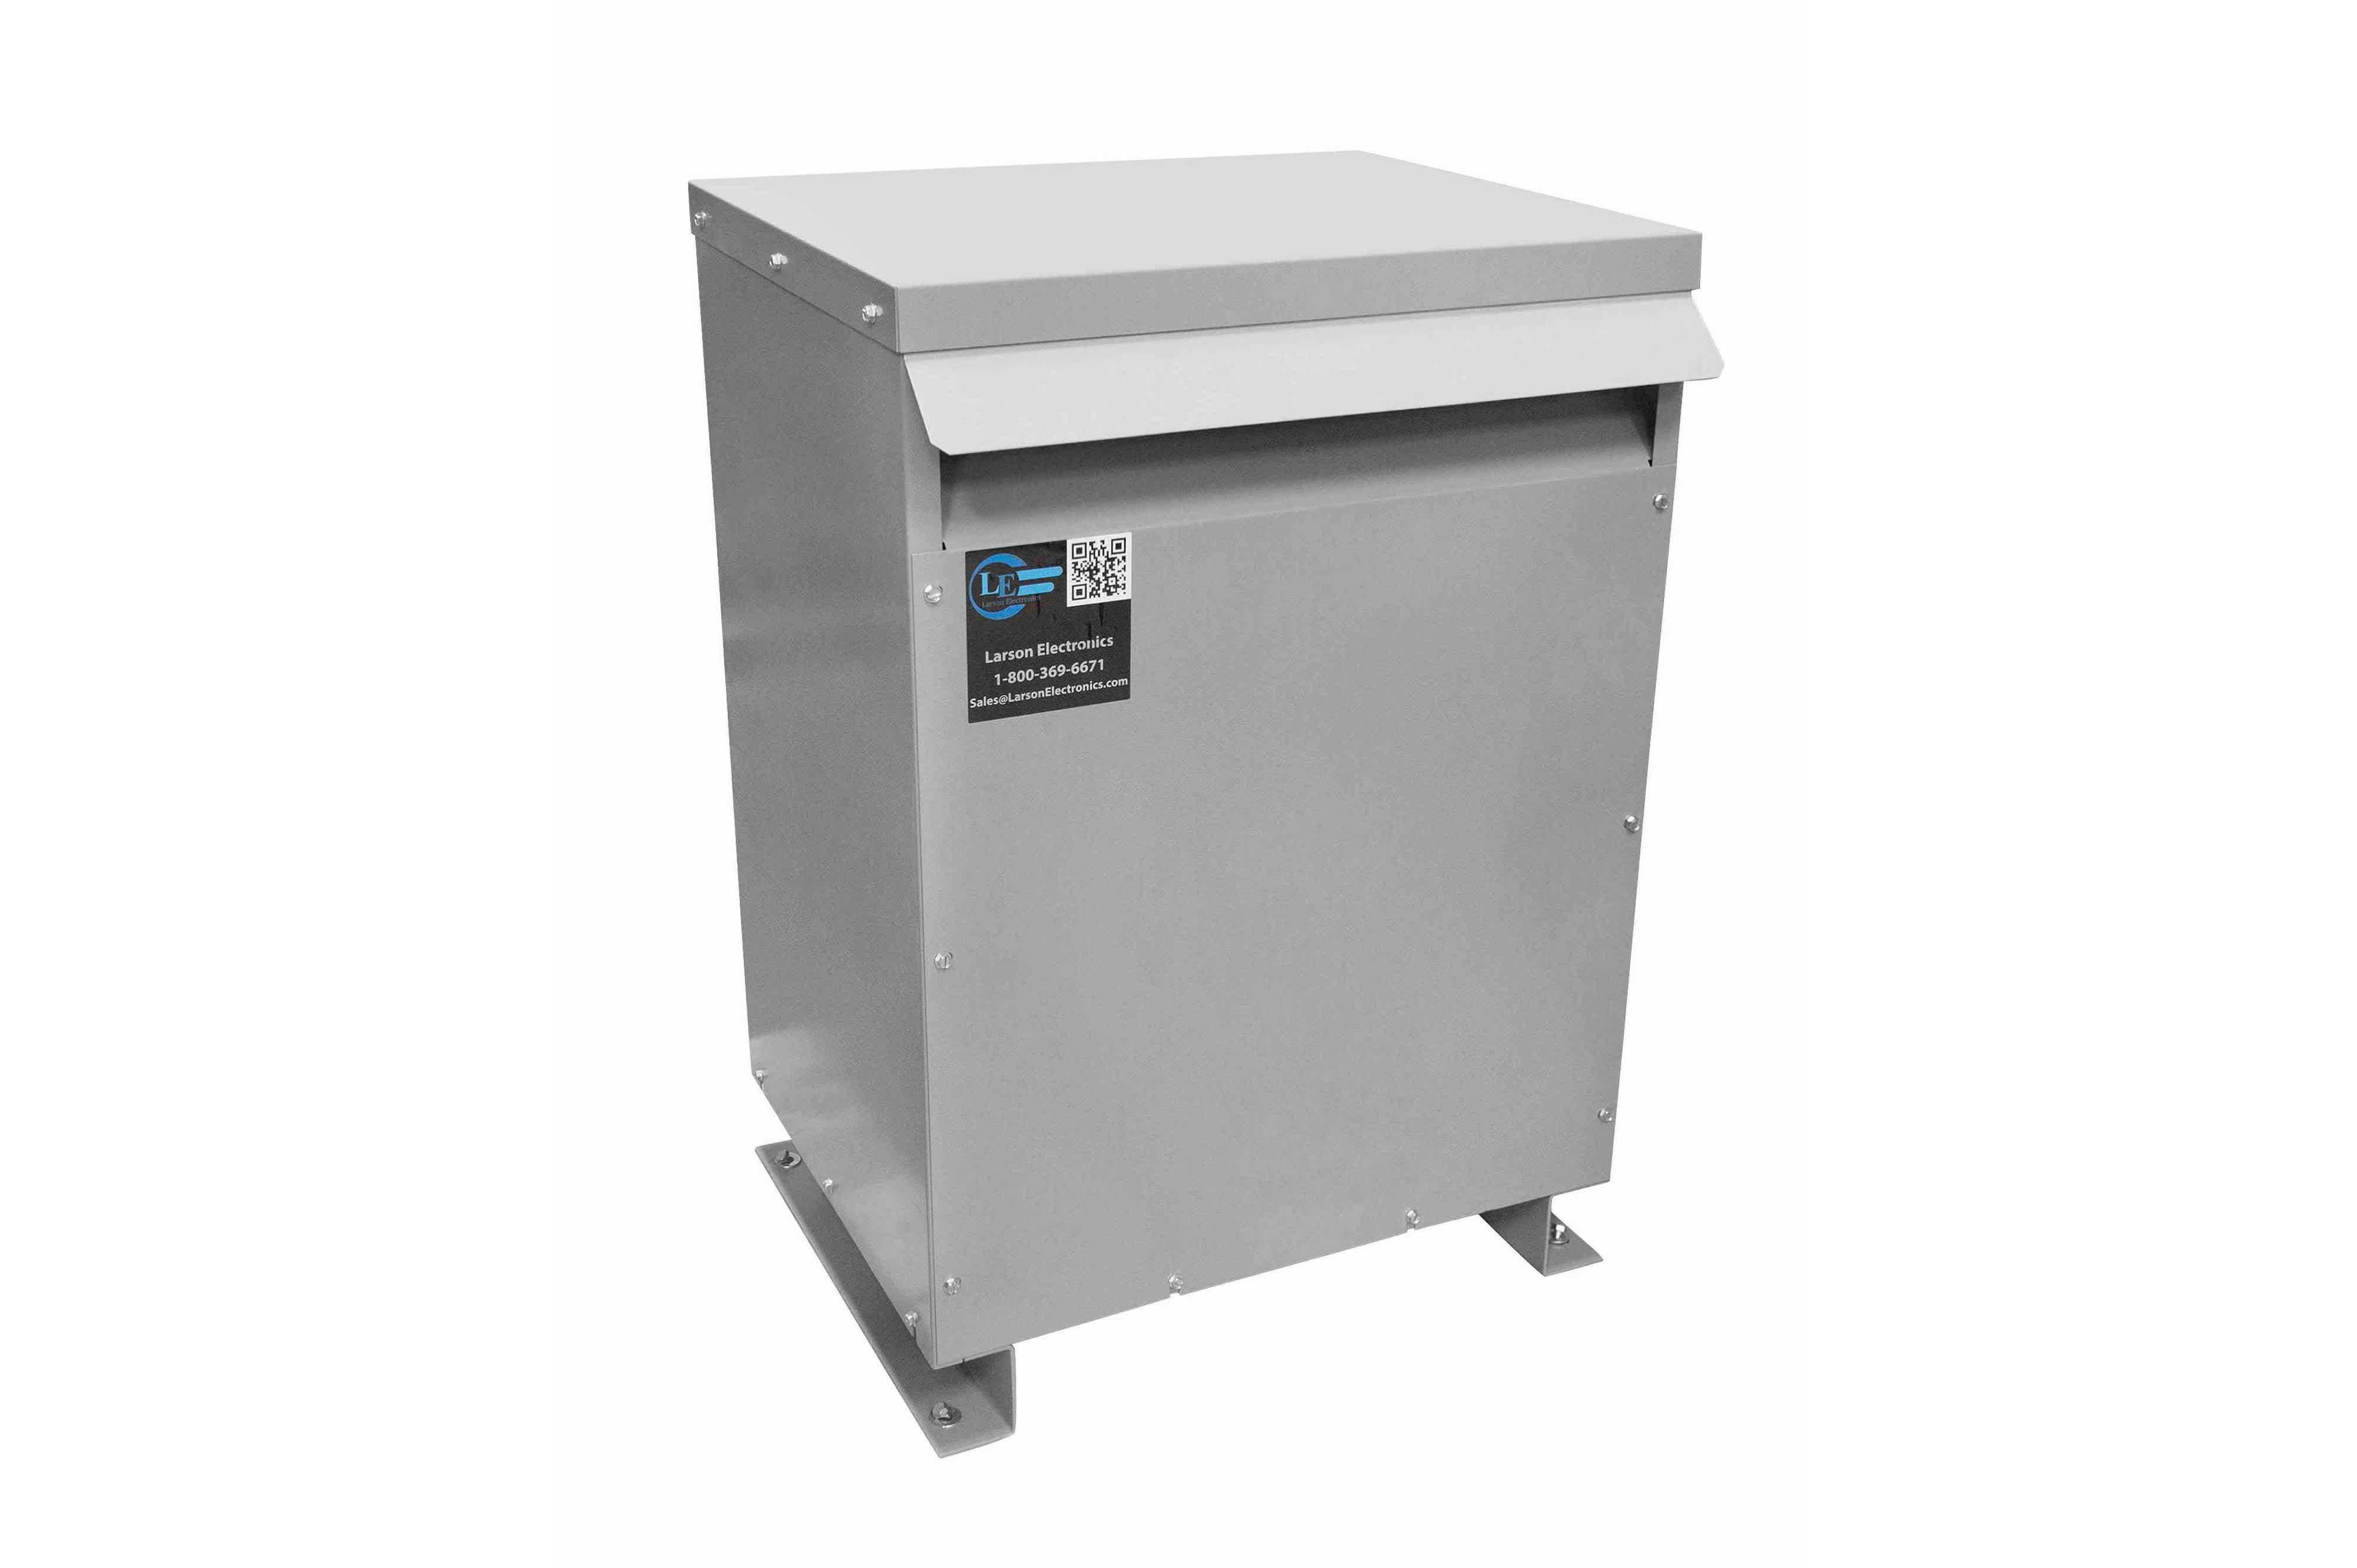 65 kVA 3PH Isolation Transformer, 440V Wye Primary, 240V Delta Secondary, N3R, Ventilated, 60 Hz